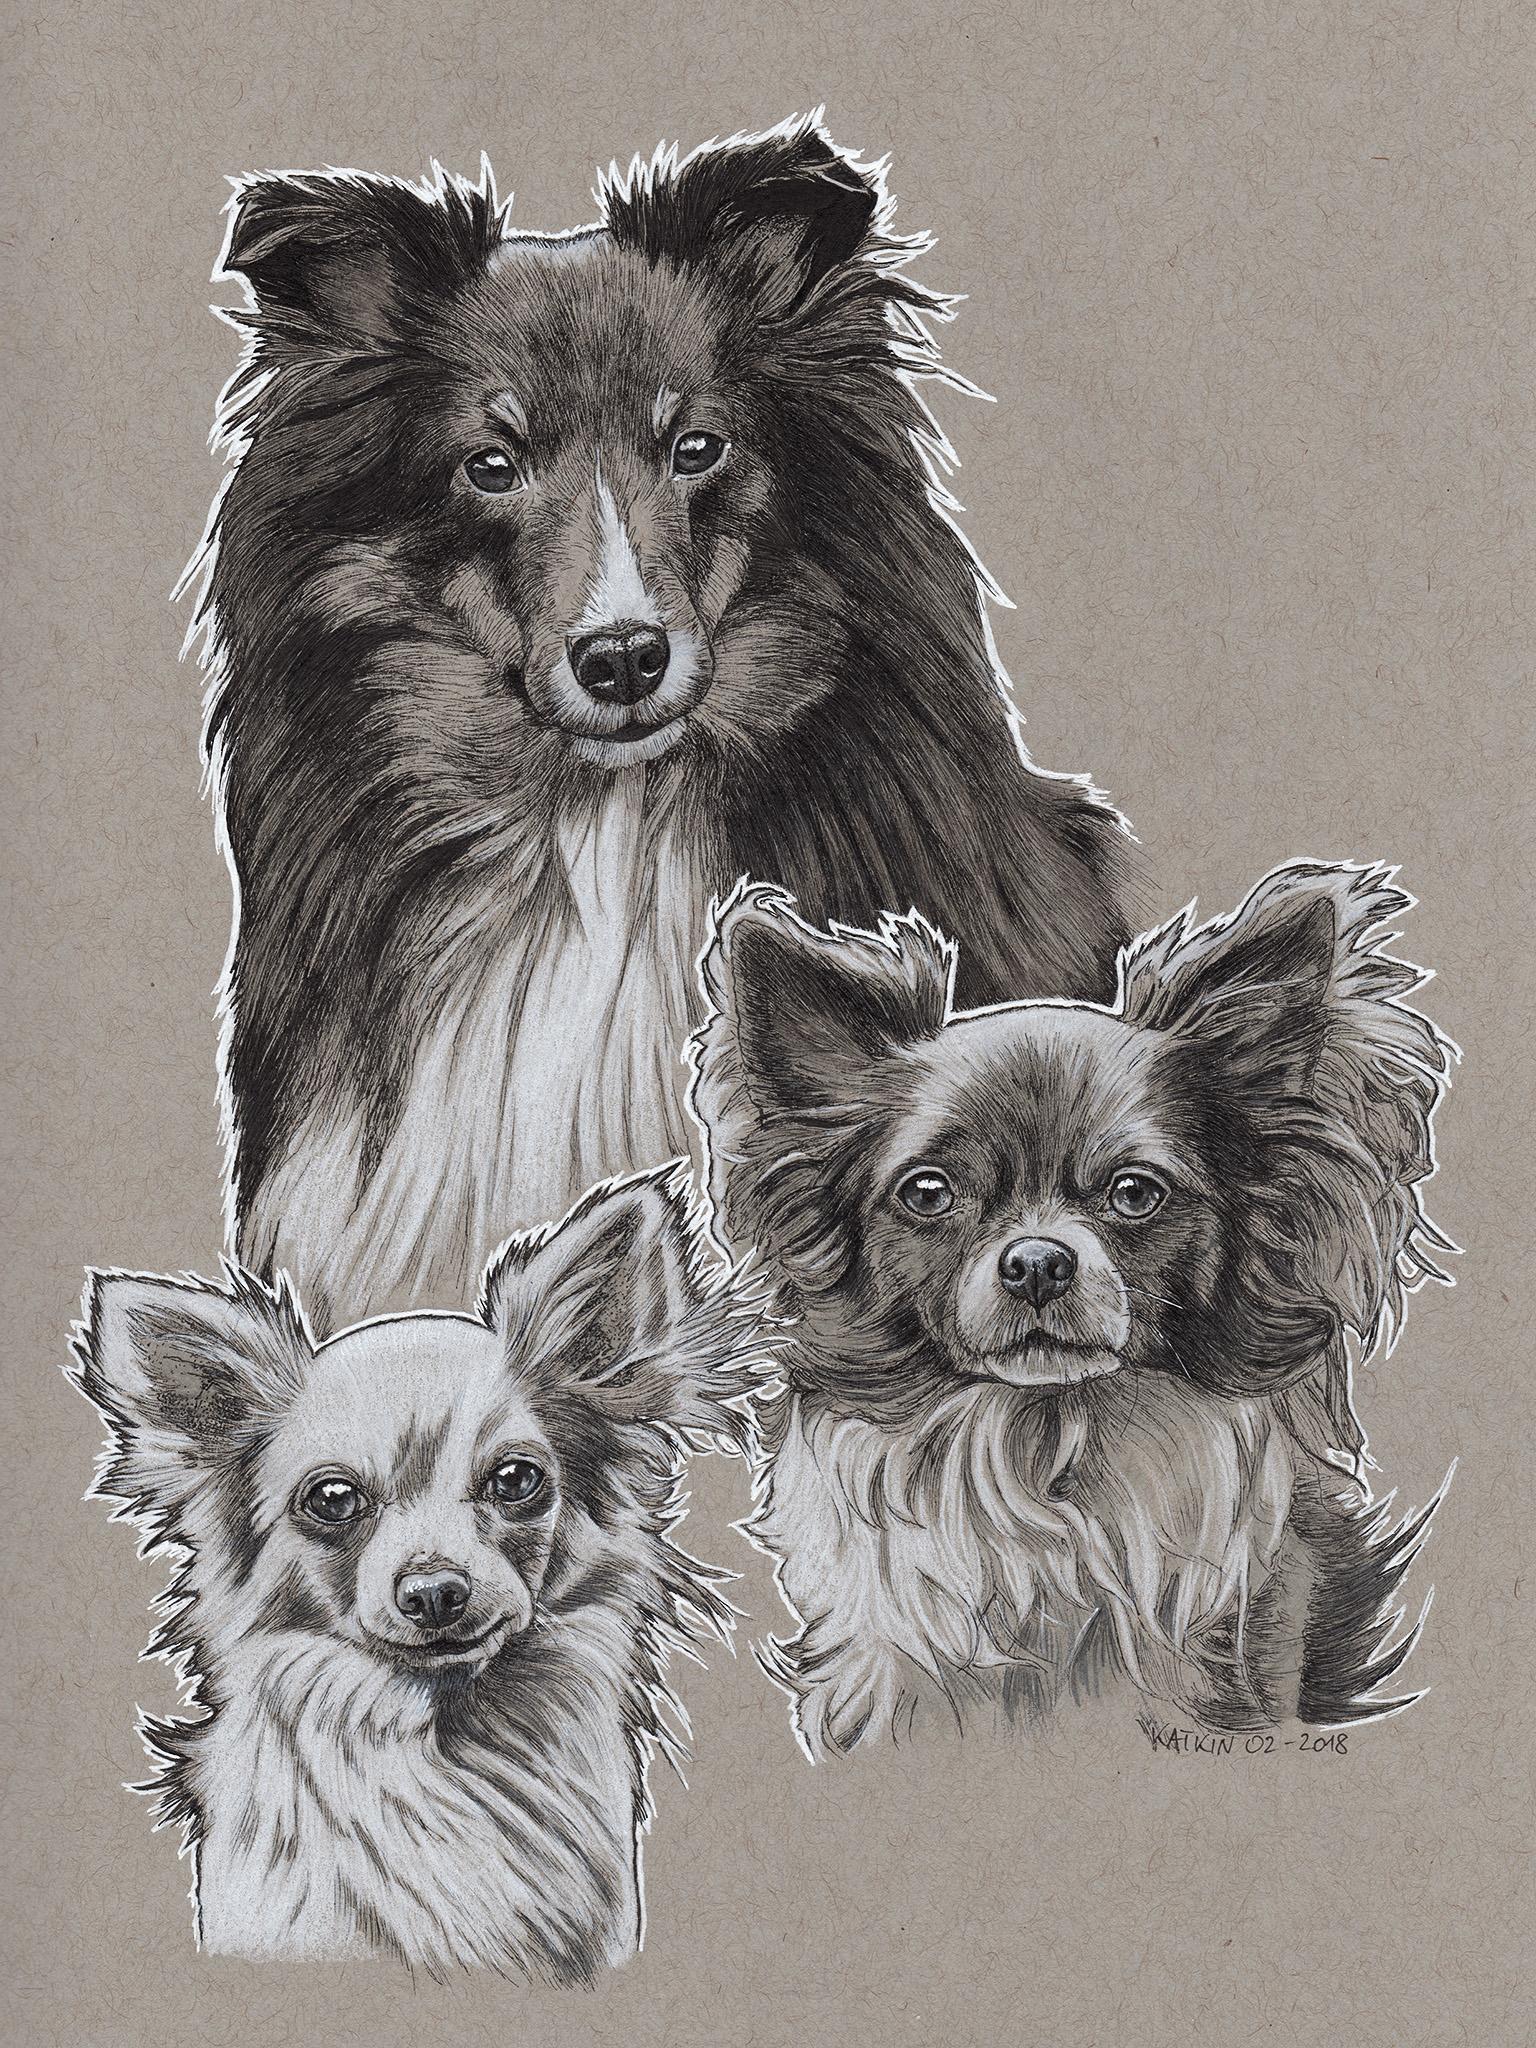 Ton in Ton Chihuahuas + Sheltie Finn, Peanut, Eevee